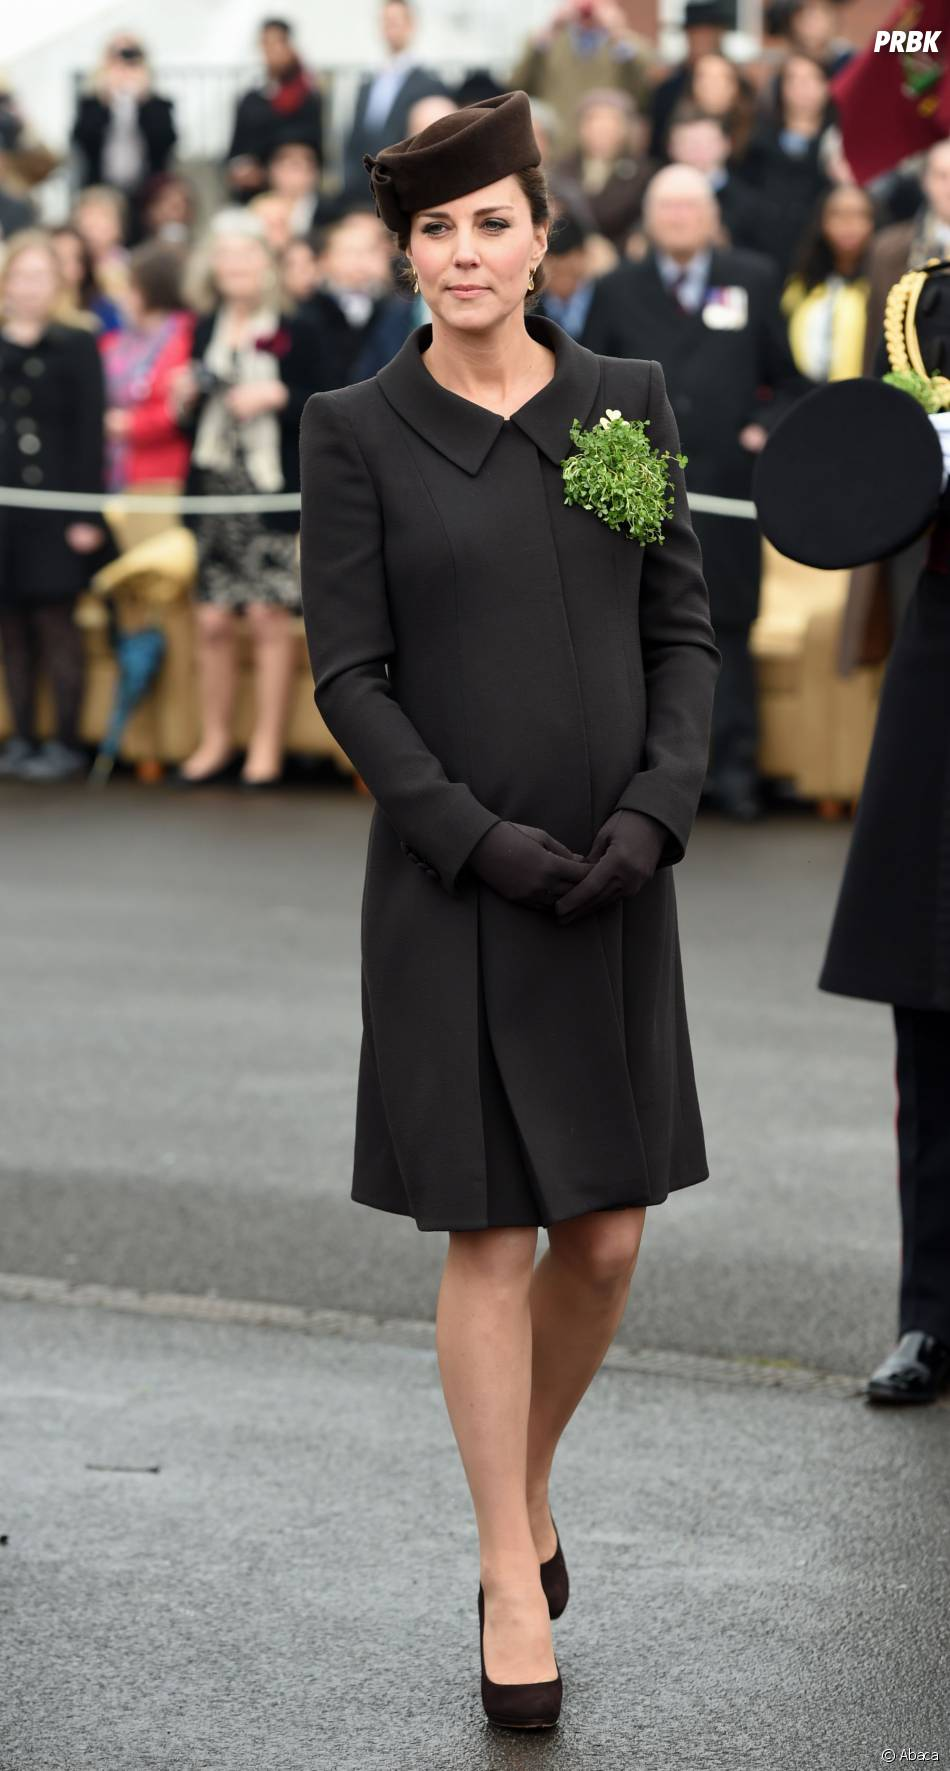 Kate Middleton enceinte et stylée